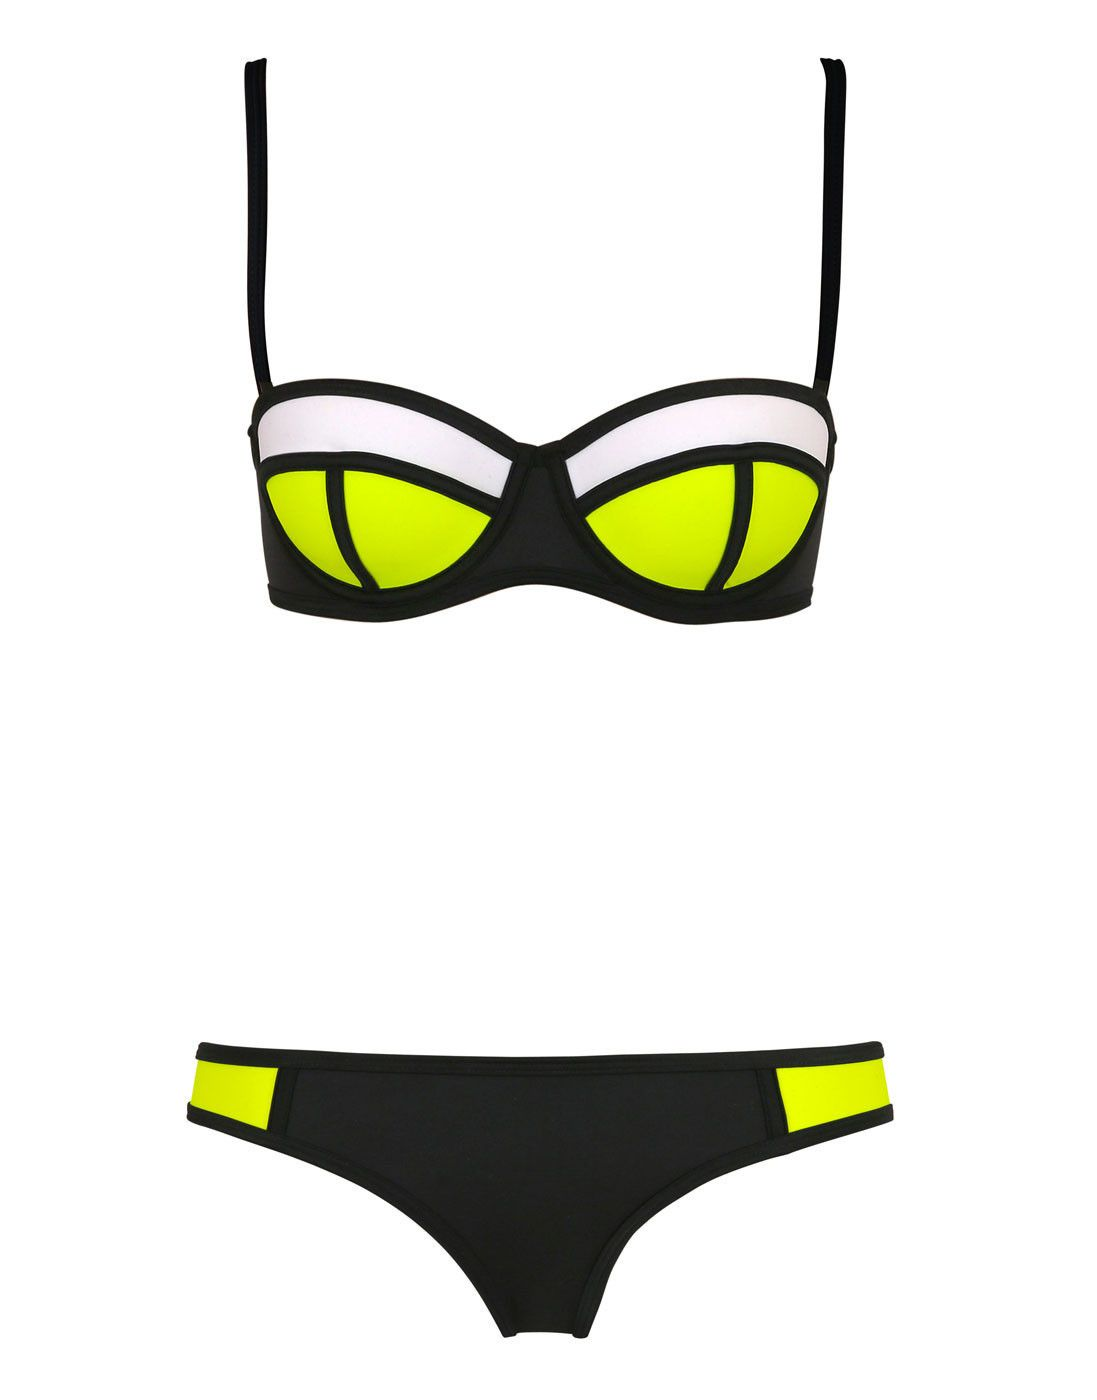 f8669564b51 Sexy Triangle Bikini With Rims Polyester Swimsuit T15010601 – Tepayi ...